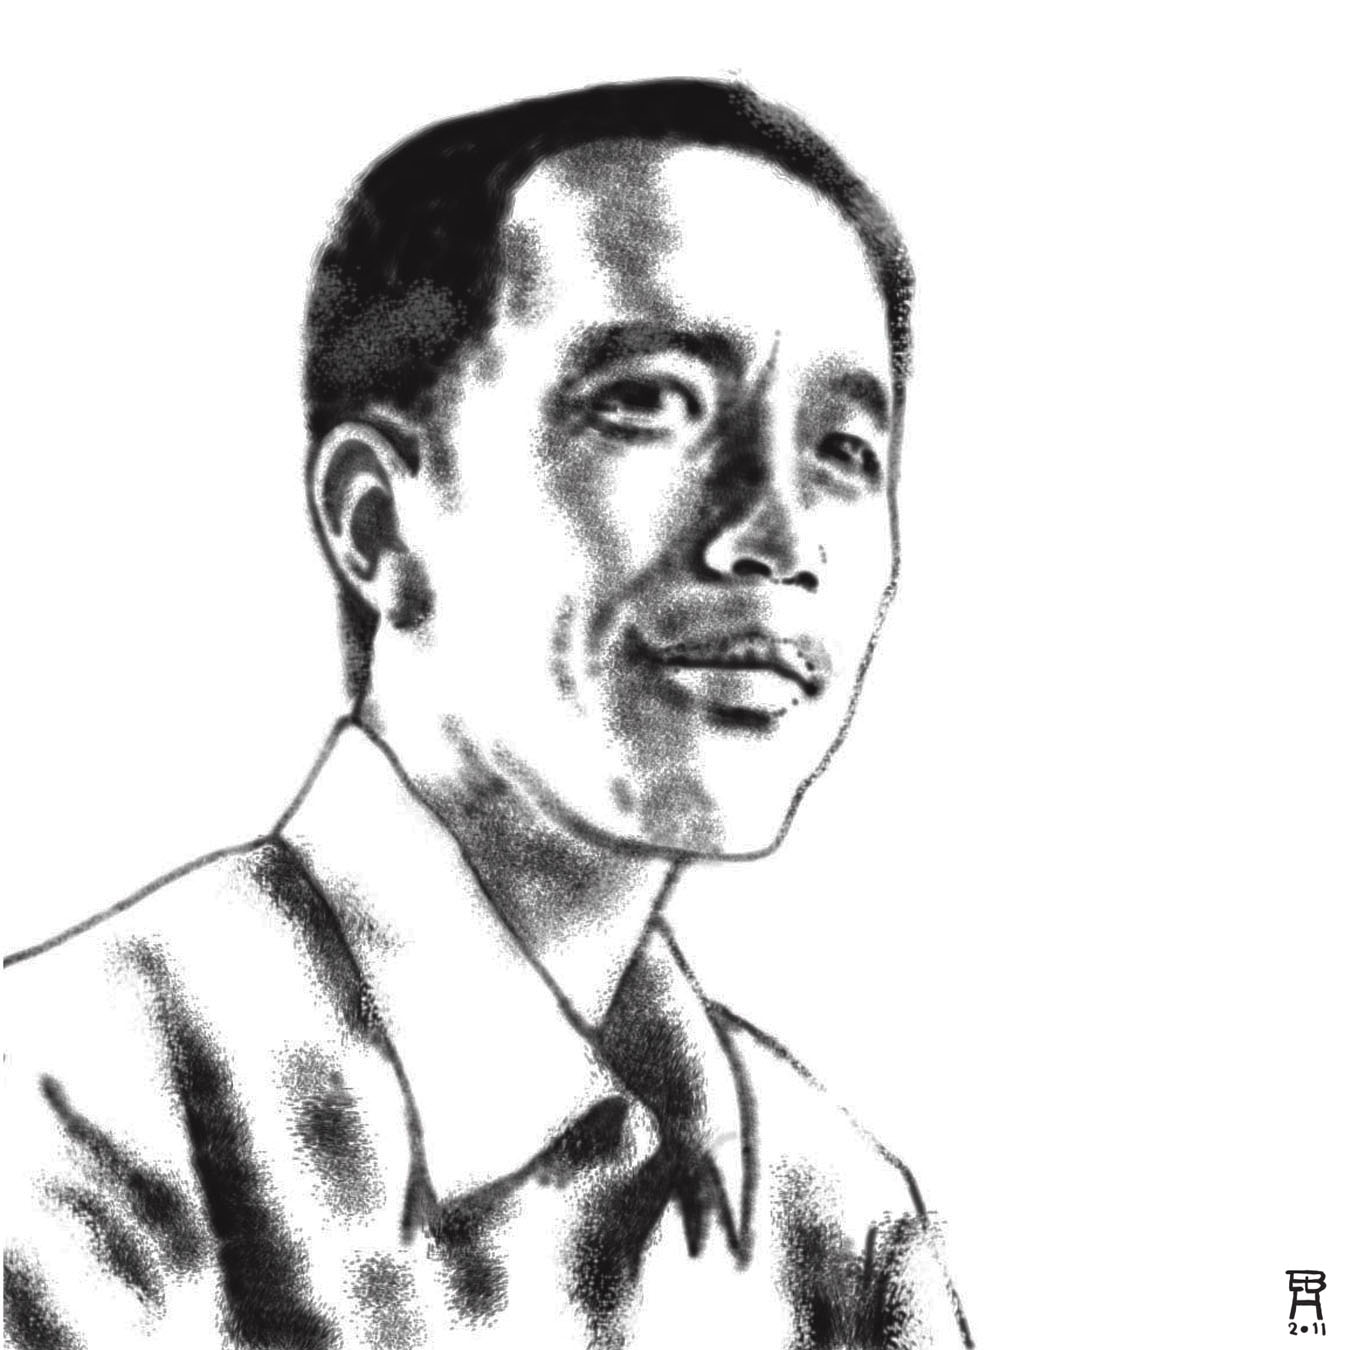 Kehutanan Ugm Jokowi Kehutanan Ugm Pada Tahun